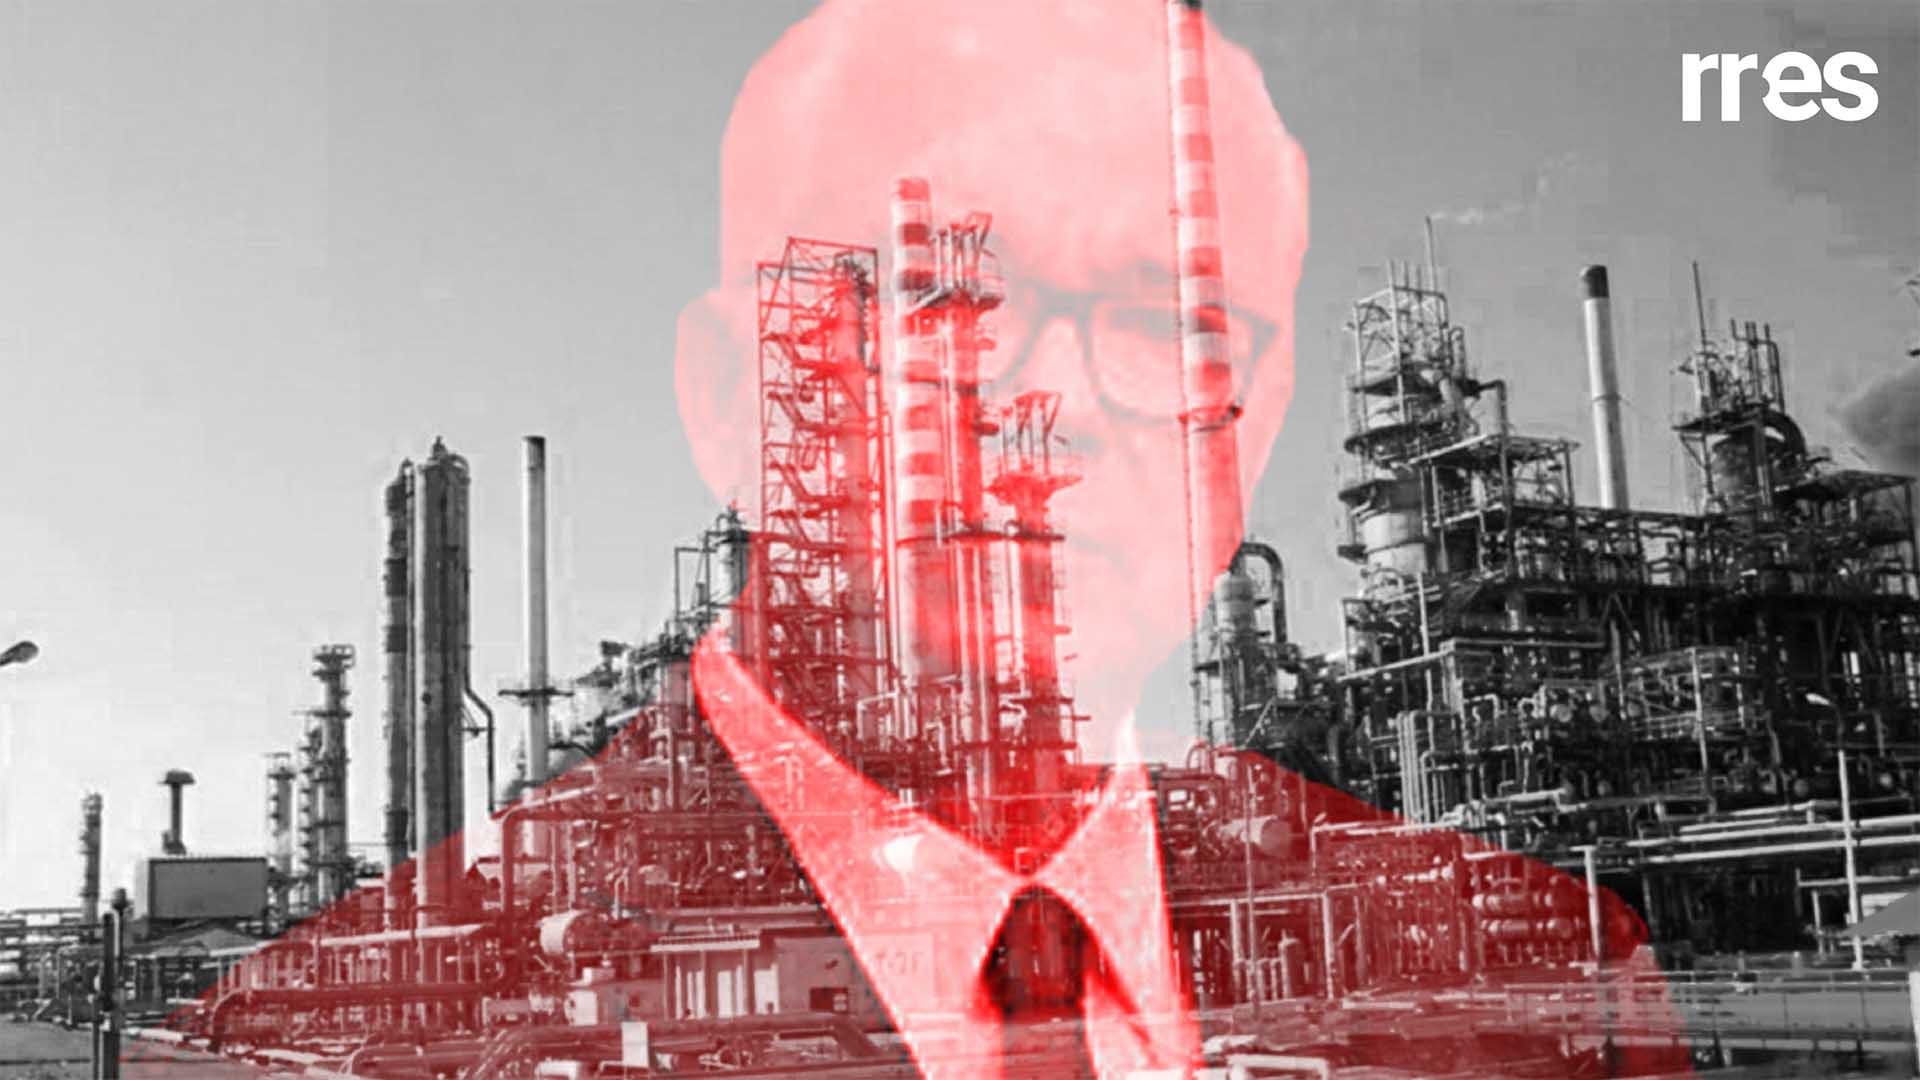 Descuartizador de refinerías, por Eddie A. Ramírez S.